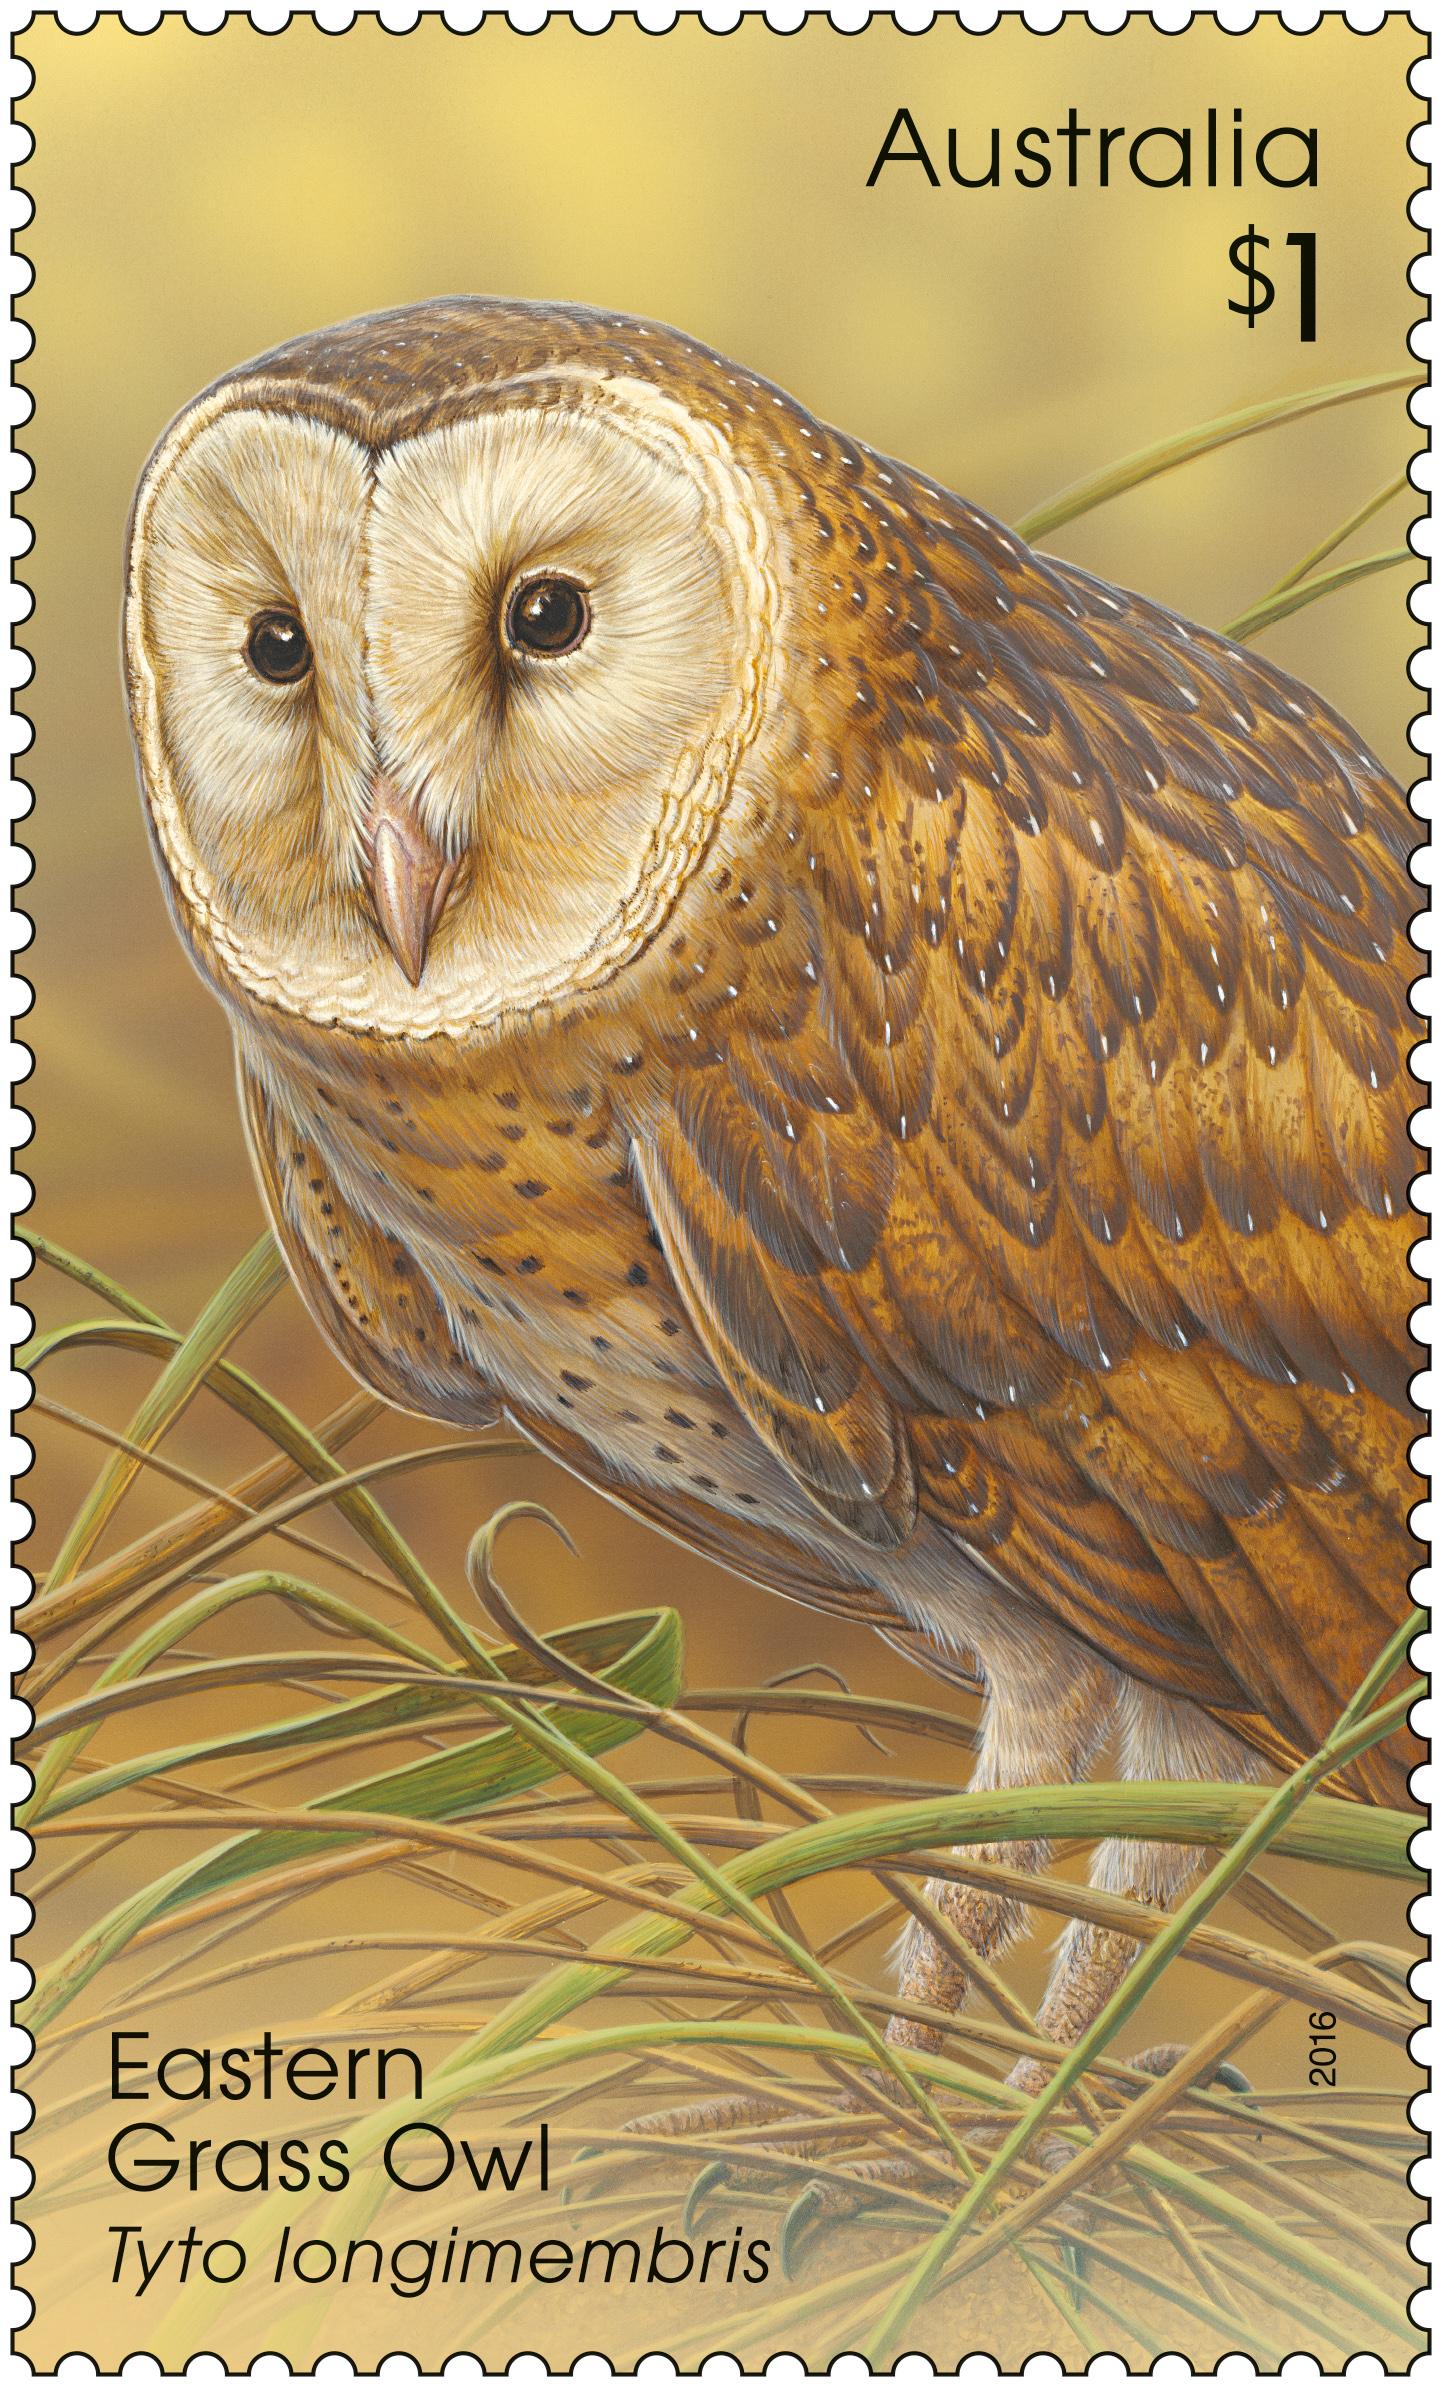 australia post takes flight with owls on stamps australia post